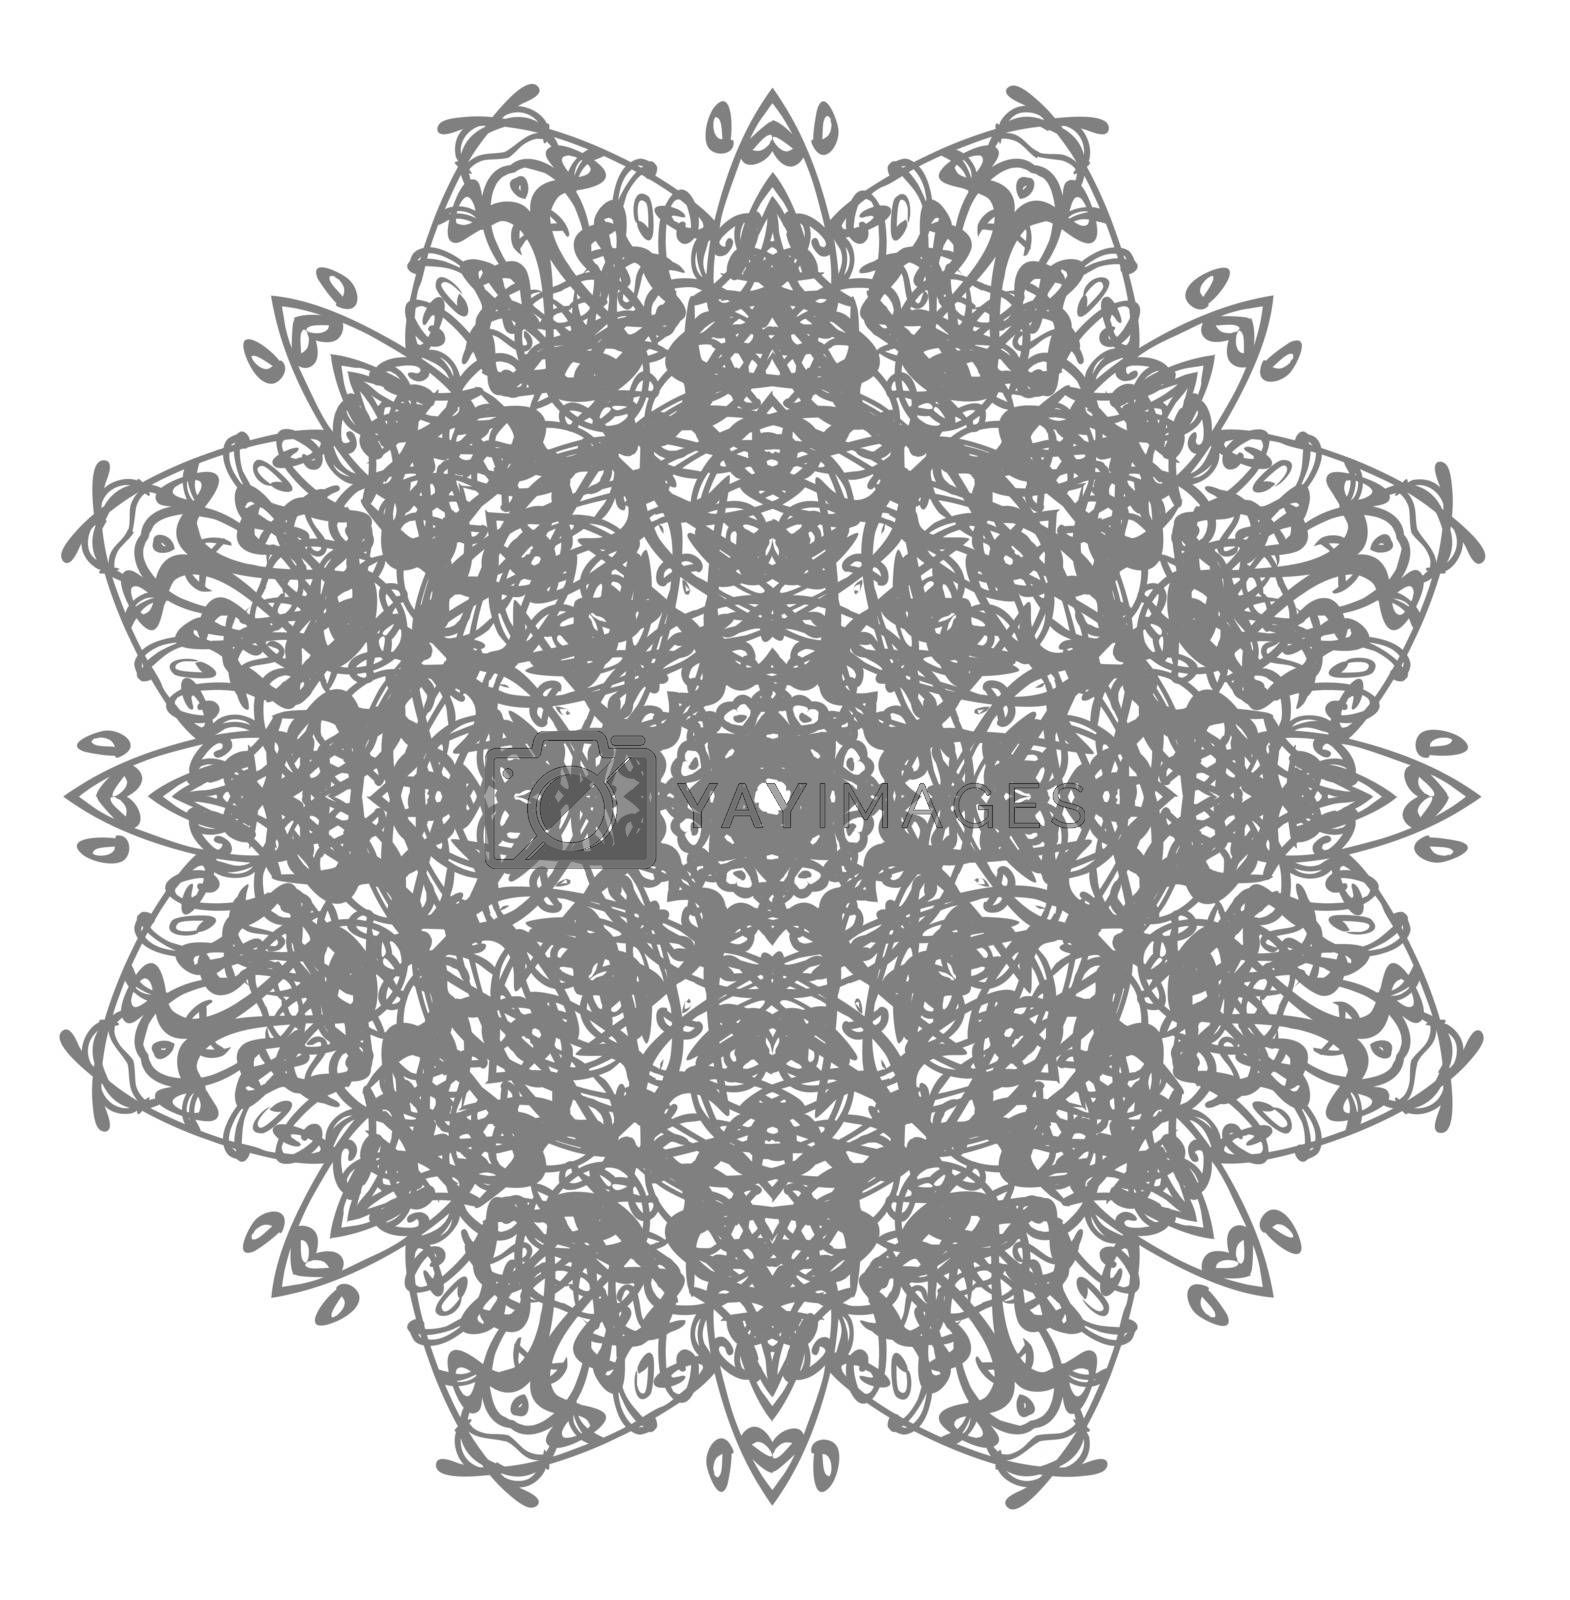 Tattoo or print illustration of beautiful and detailed elegant grey mandala